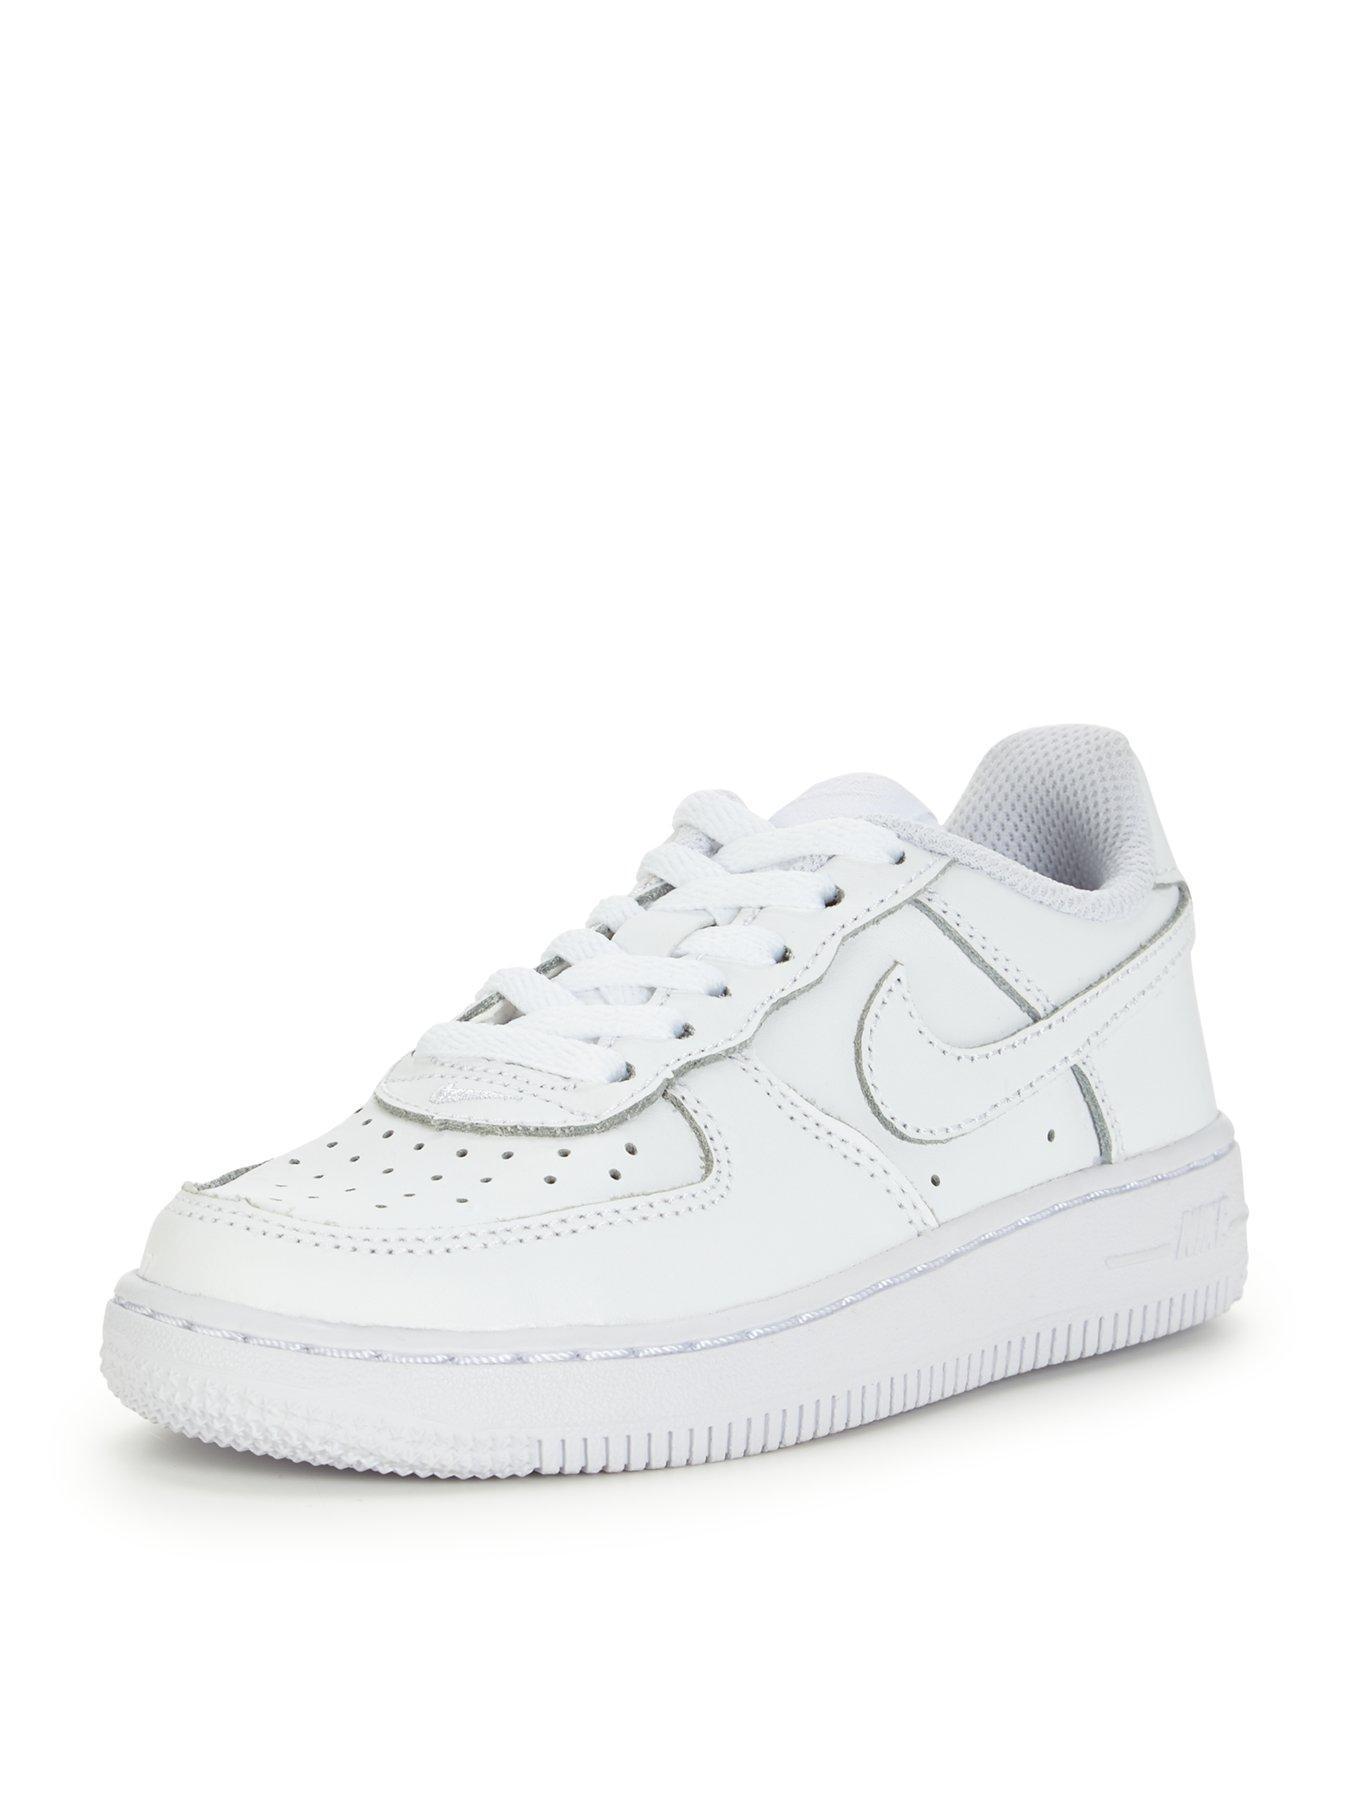 Nike Nike Air Force 1 Childrens Trainer